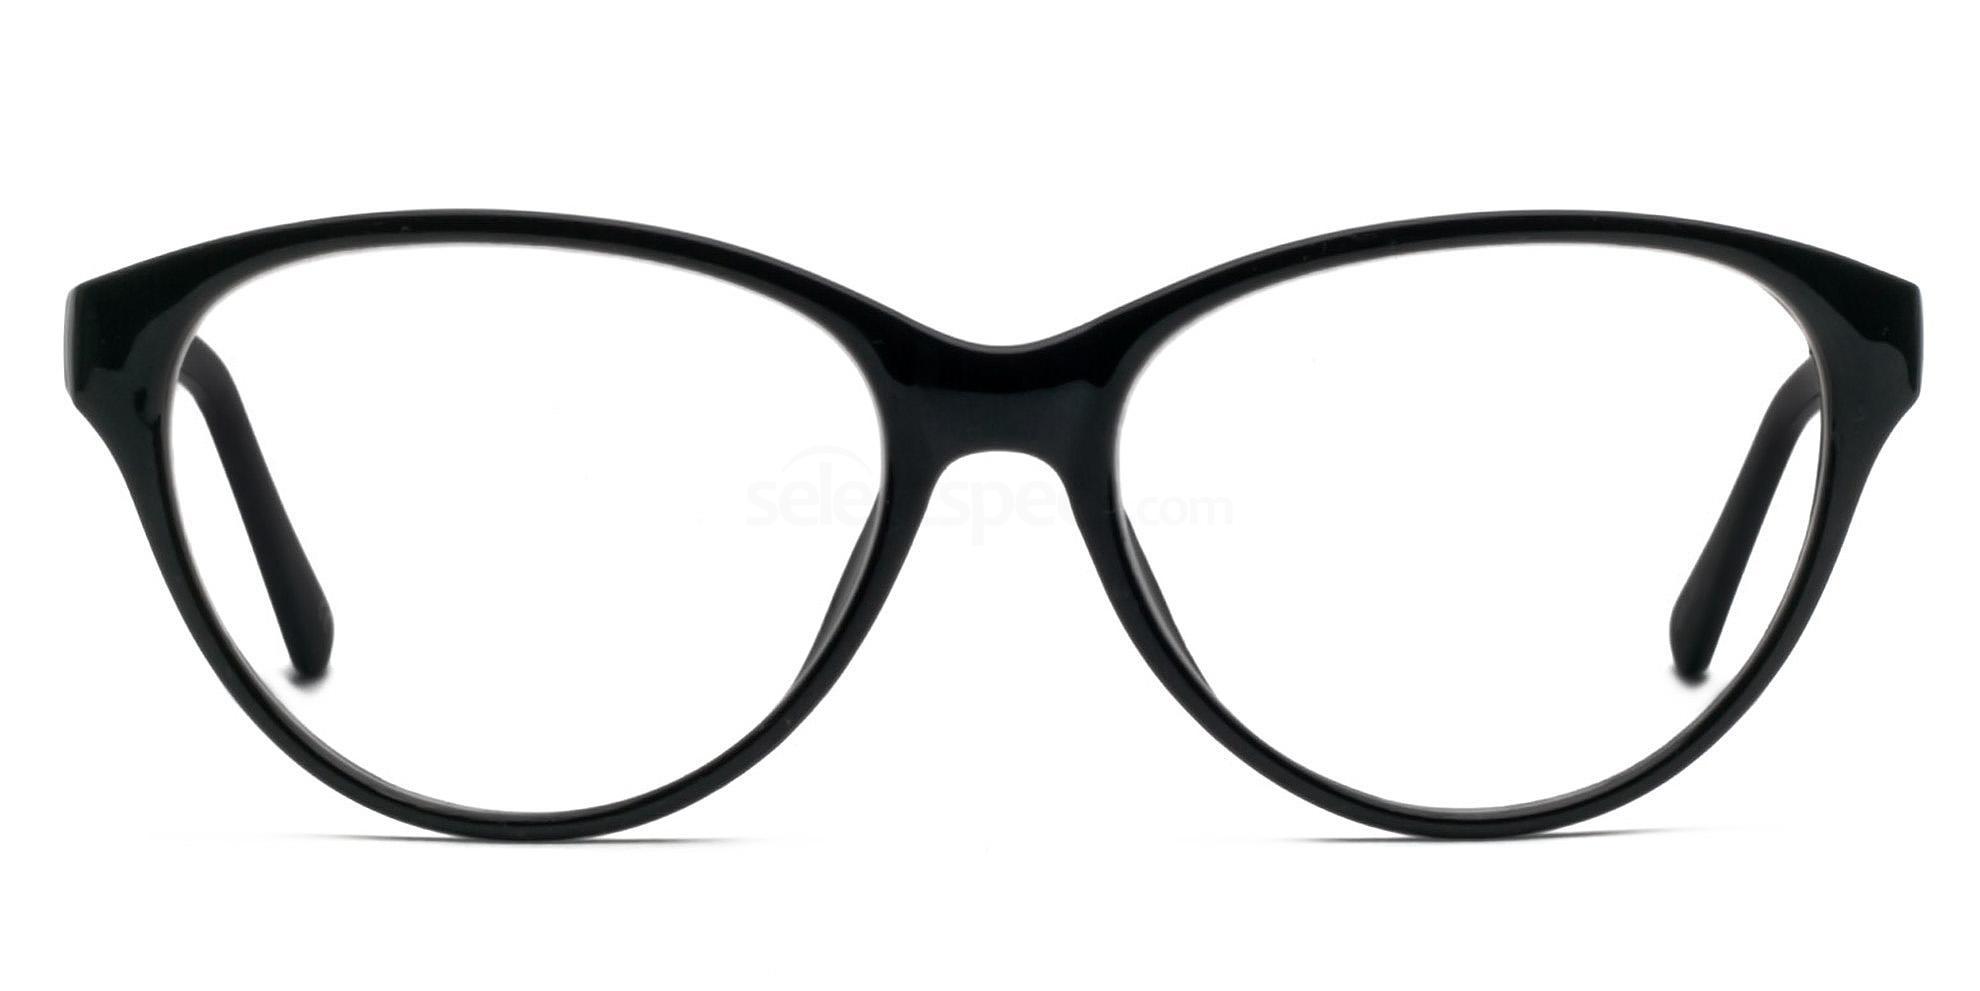 COL 01 2440 Glasses, Infinity